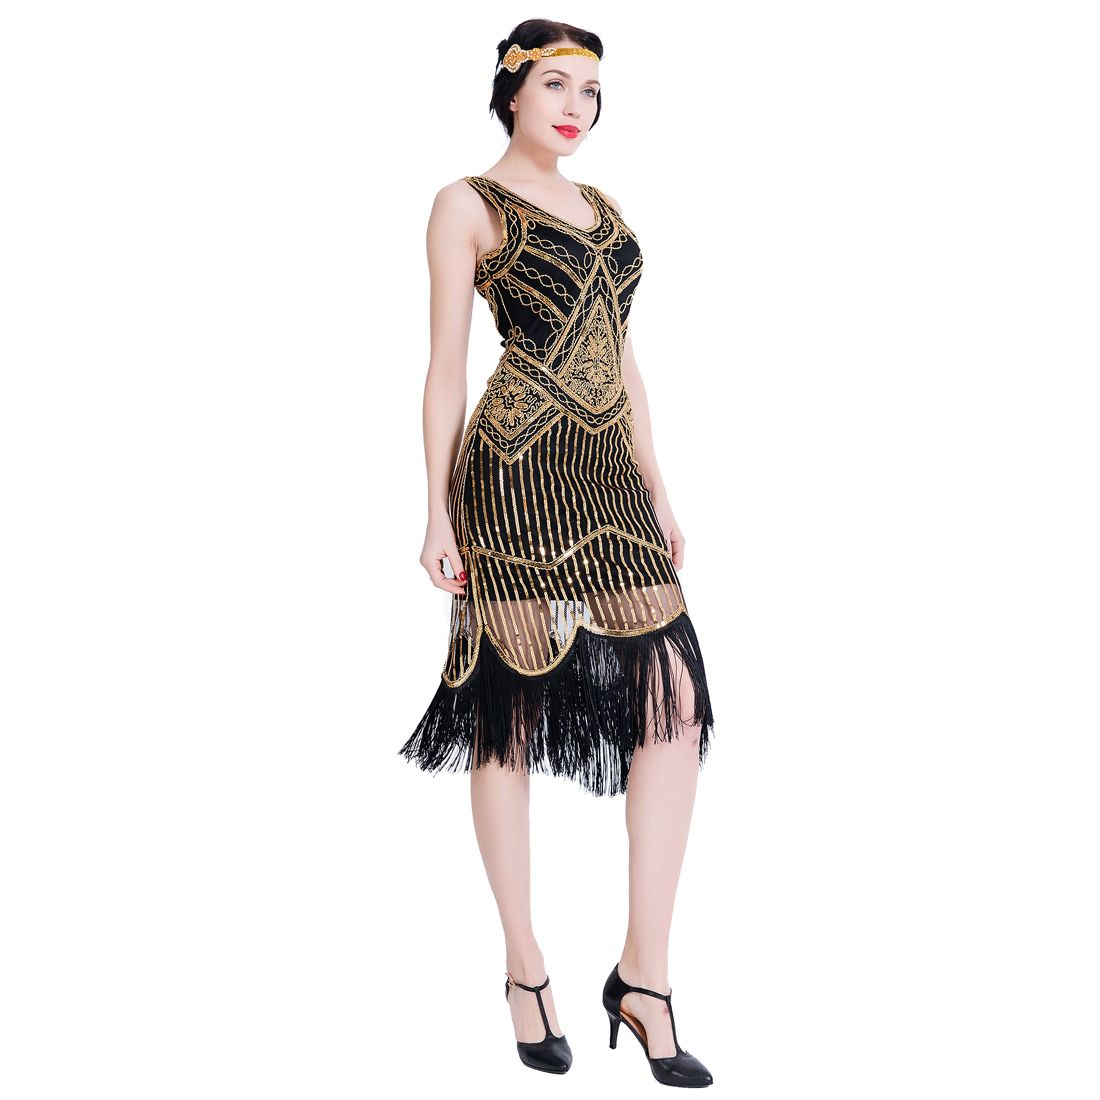 Great Gatsby 1920s Flapper Dress Art Deco Women Vintage Clothing Fashion Art Dress Flapper Dress